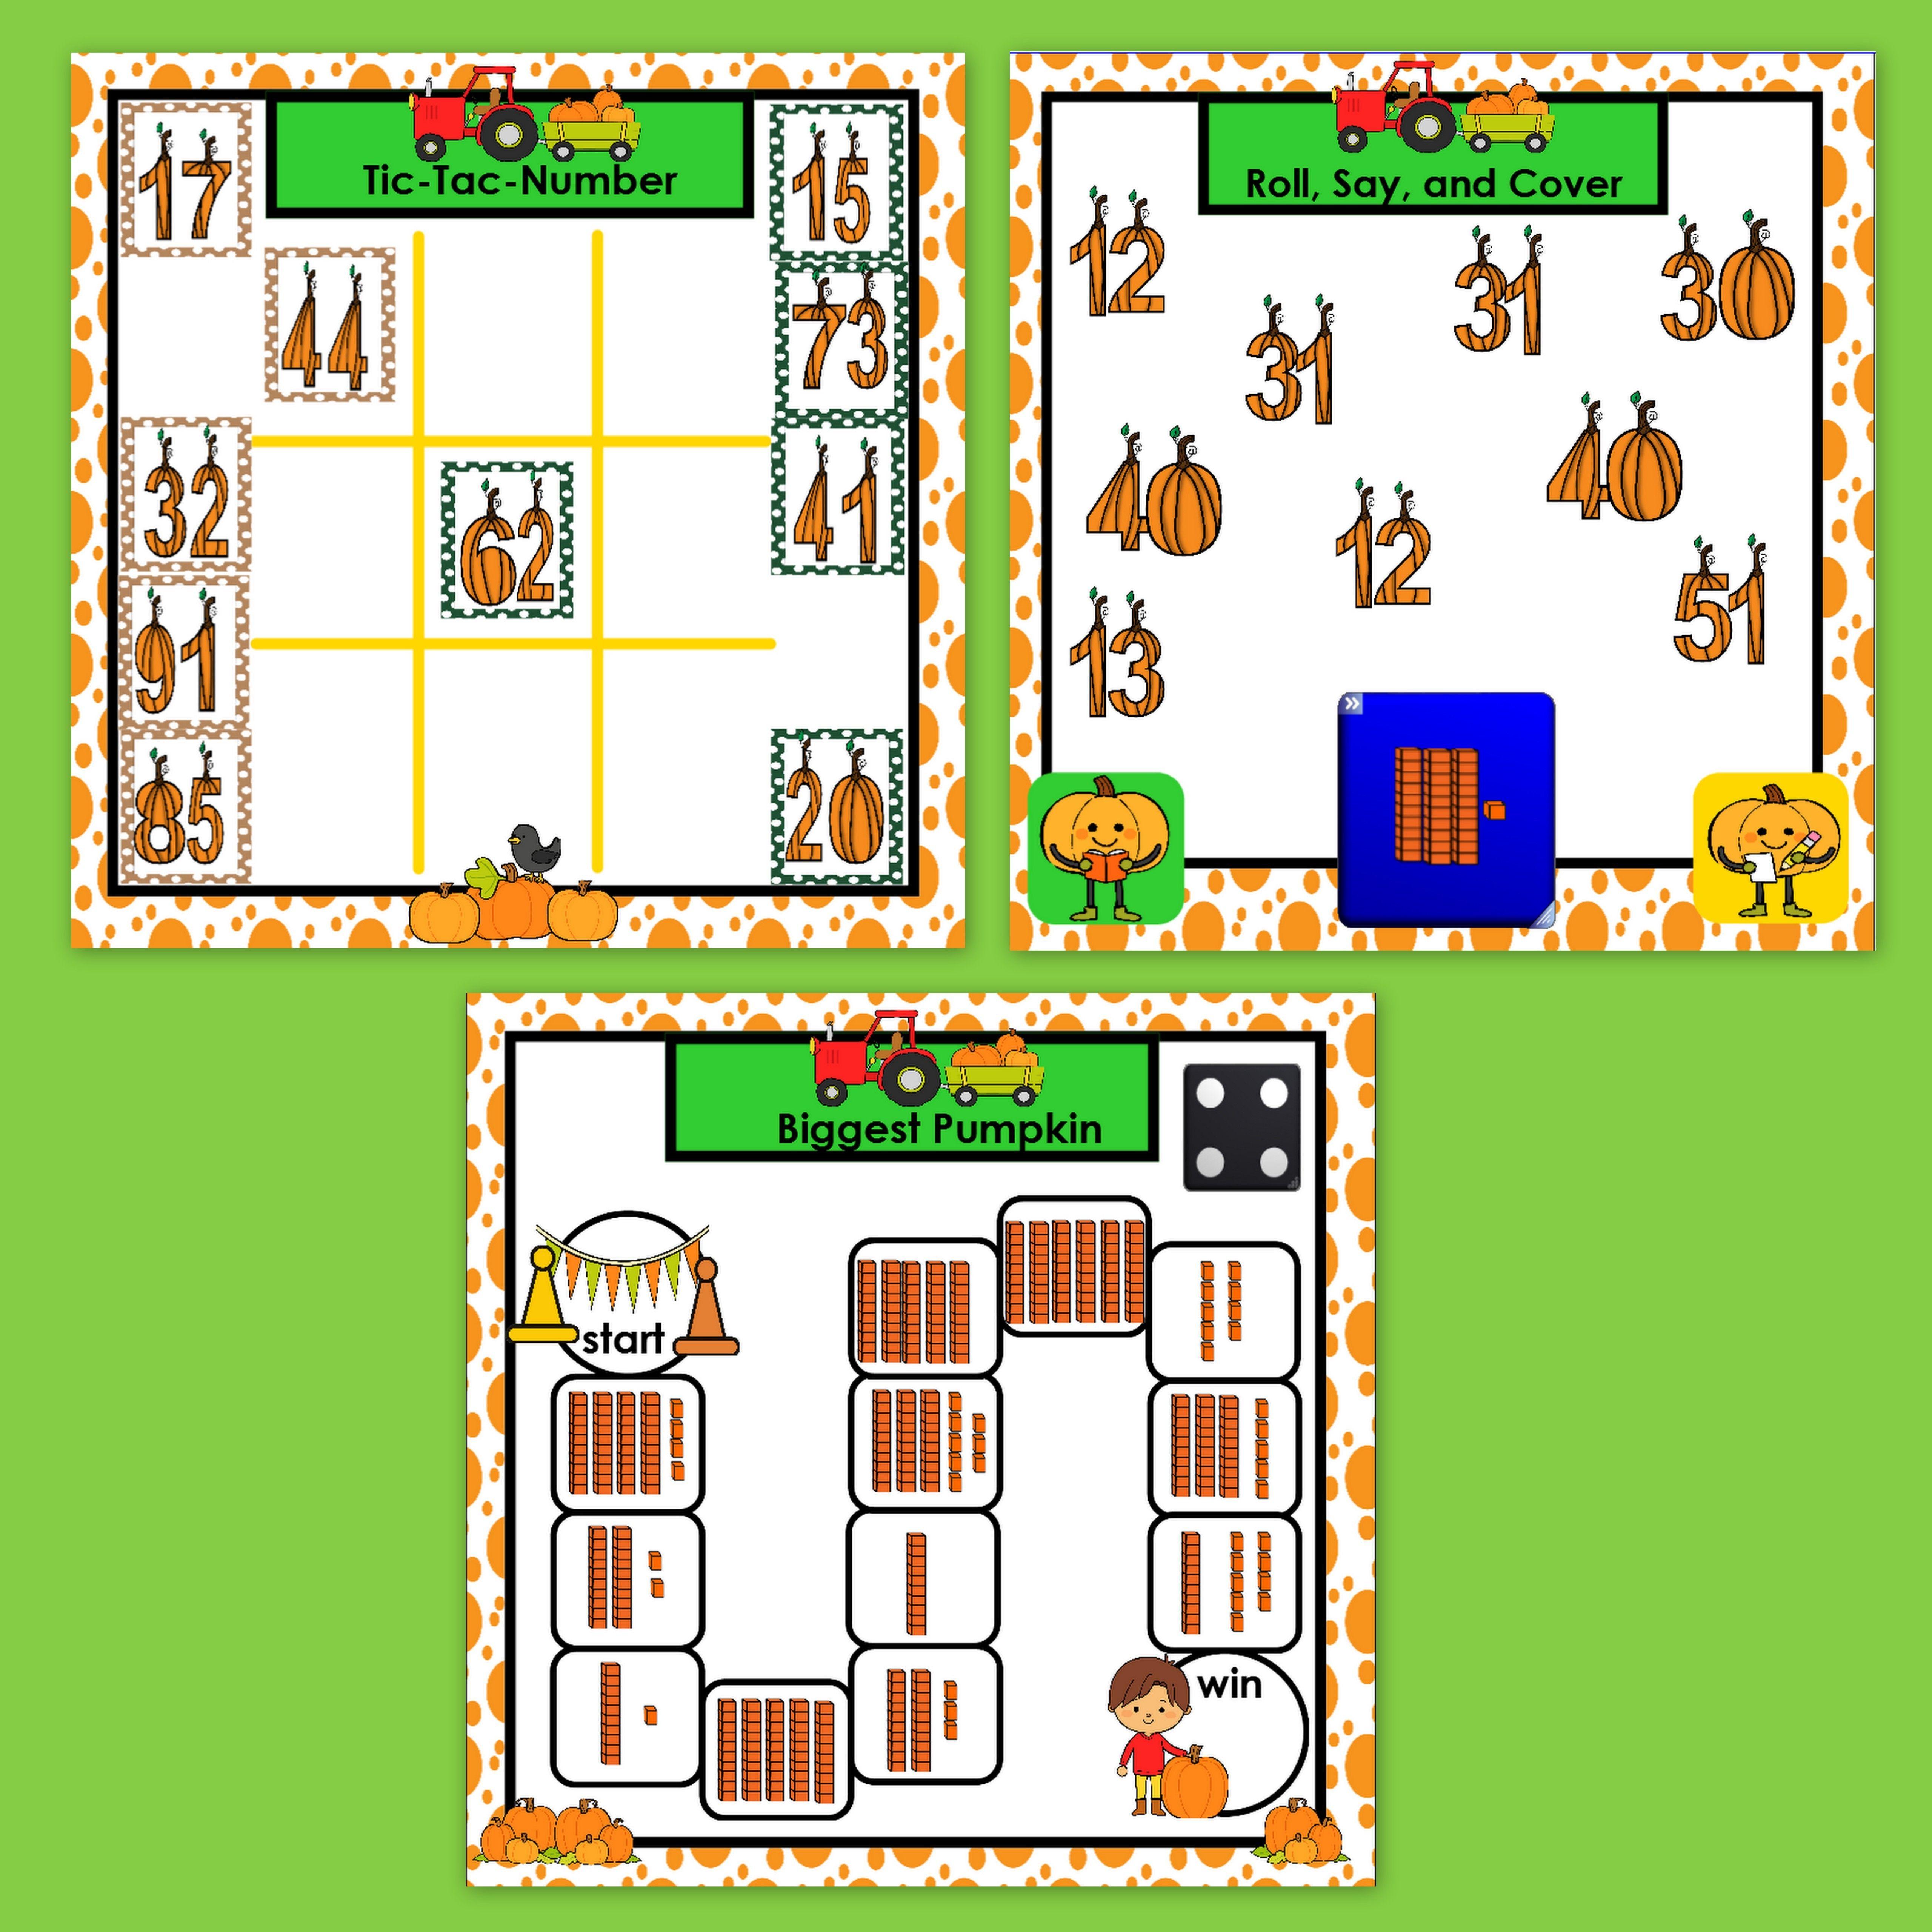 6a0605d06788f5f5ba4f3142486f41c0 - Smartboard Games For Kindergarten